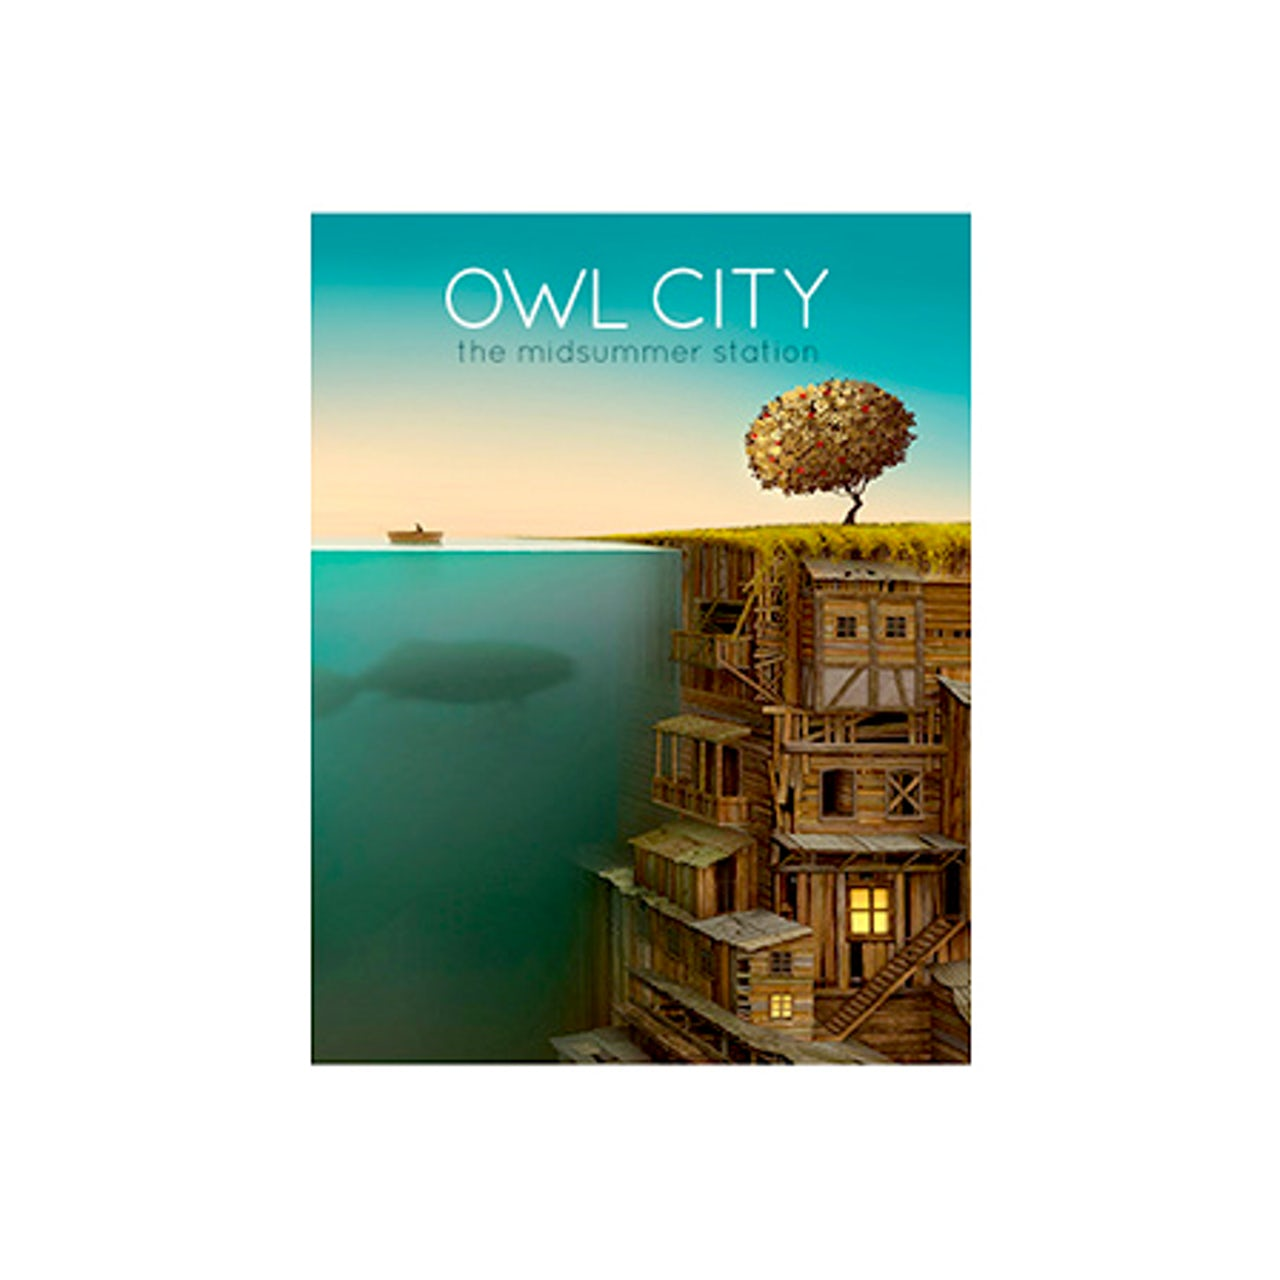 Owl City The Midsummer Station Pocket Folder